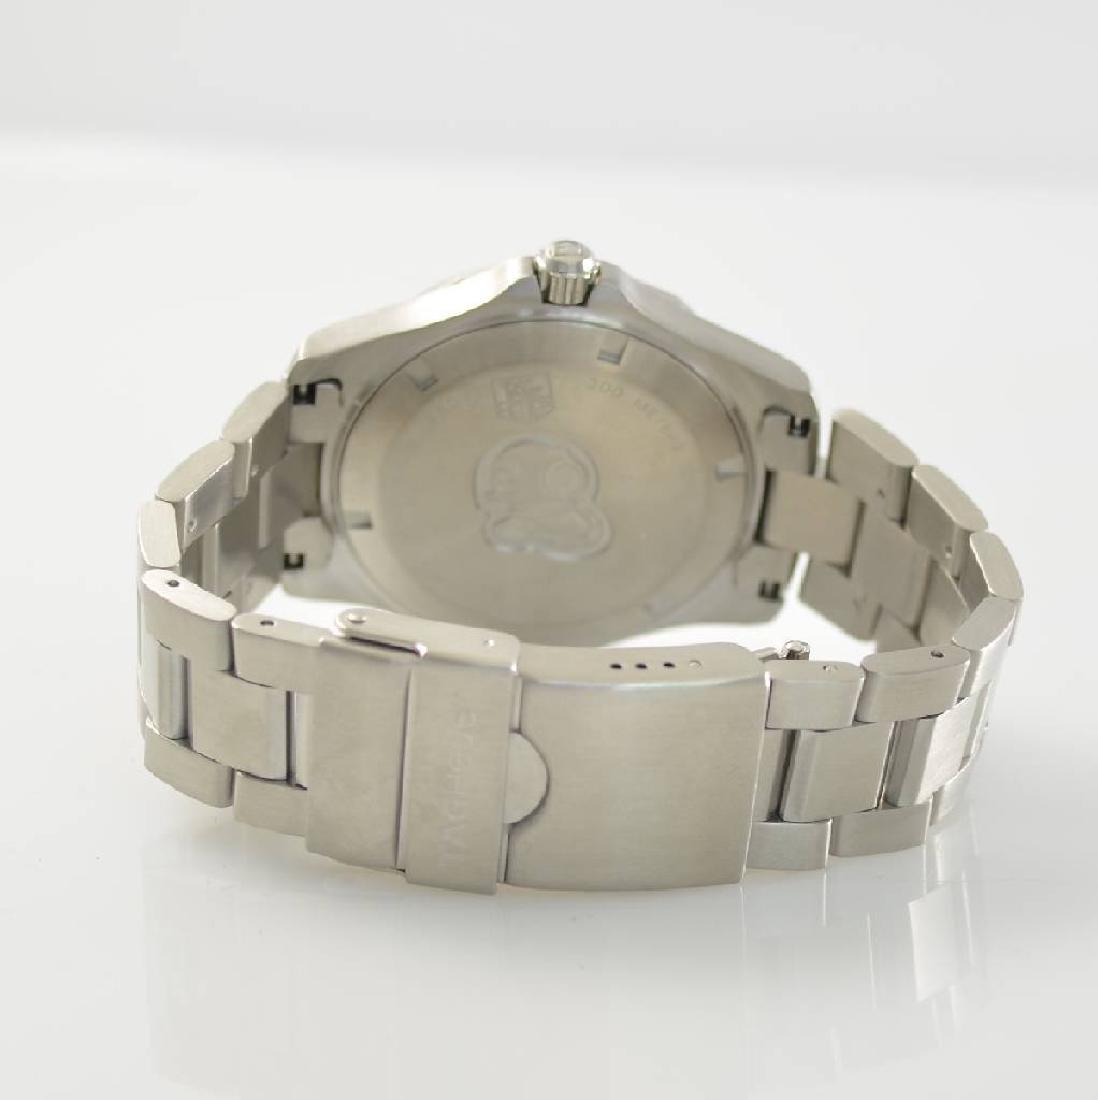 TAG HEUER gents wristwatch Aquaracer - 5